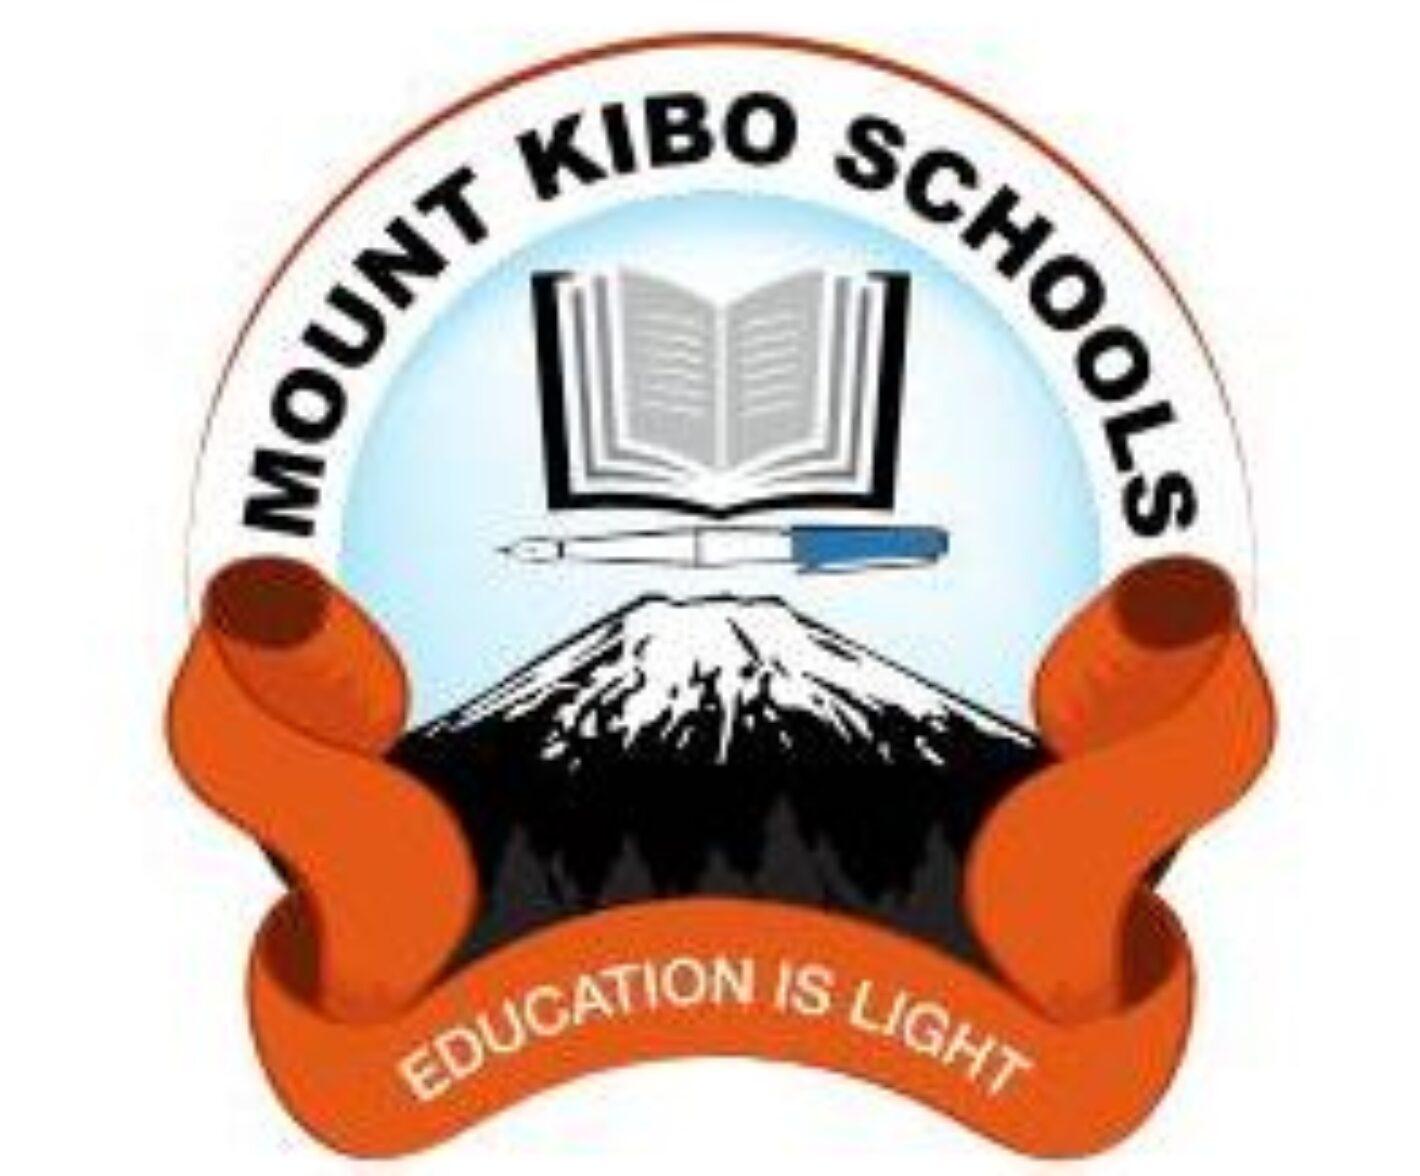 Mount Kibo Schools